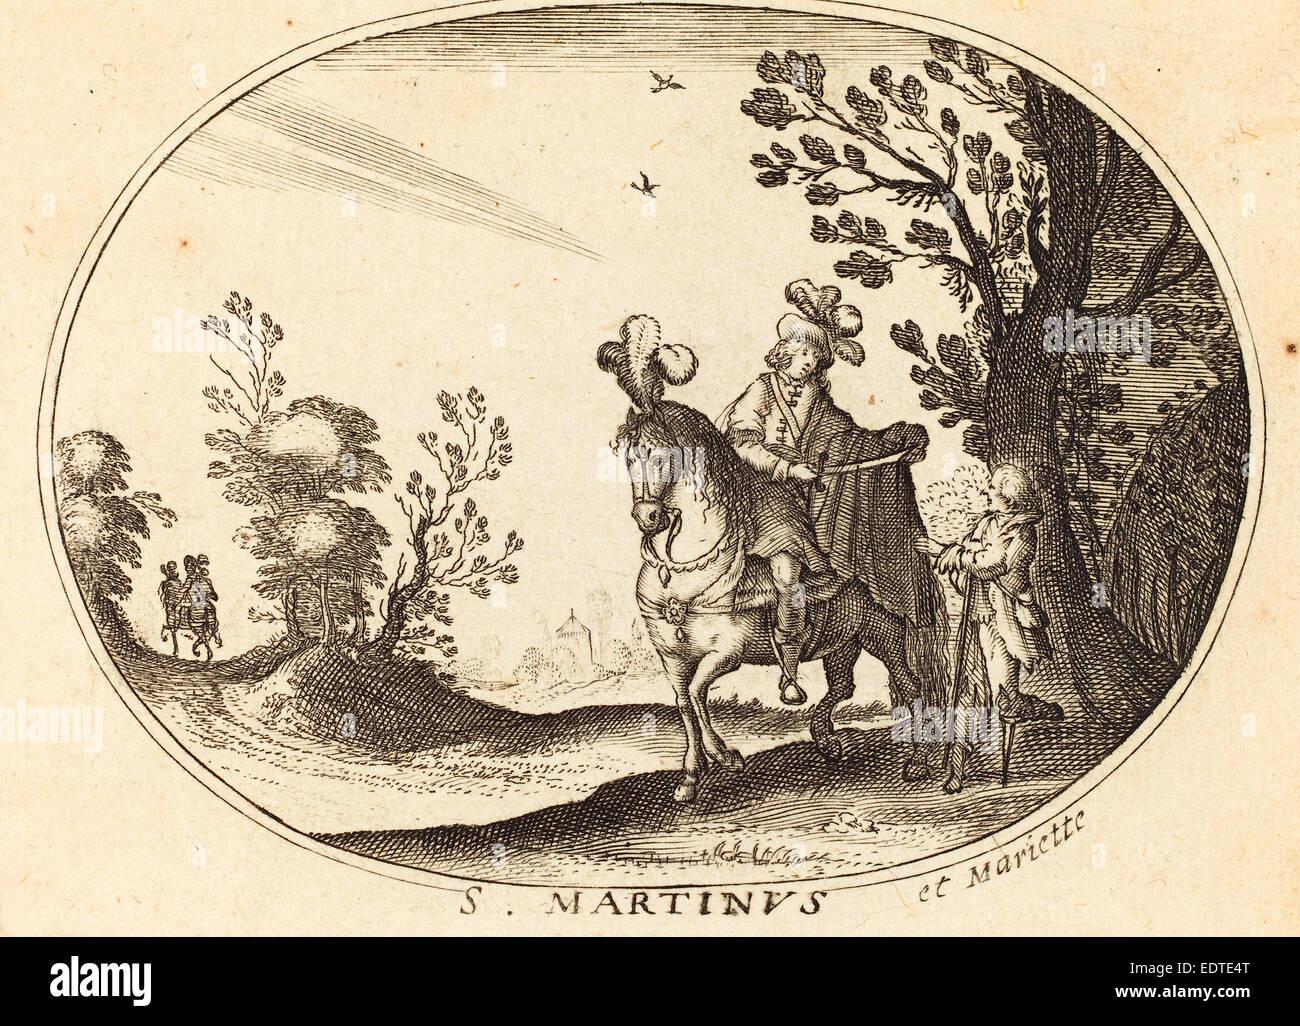 Balthasar Moncornet (French, c. 1600 - 1668), Saint Martin and the Beggar, engraving - Stock Image